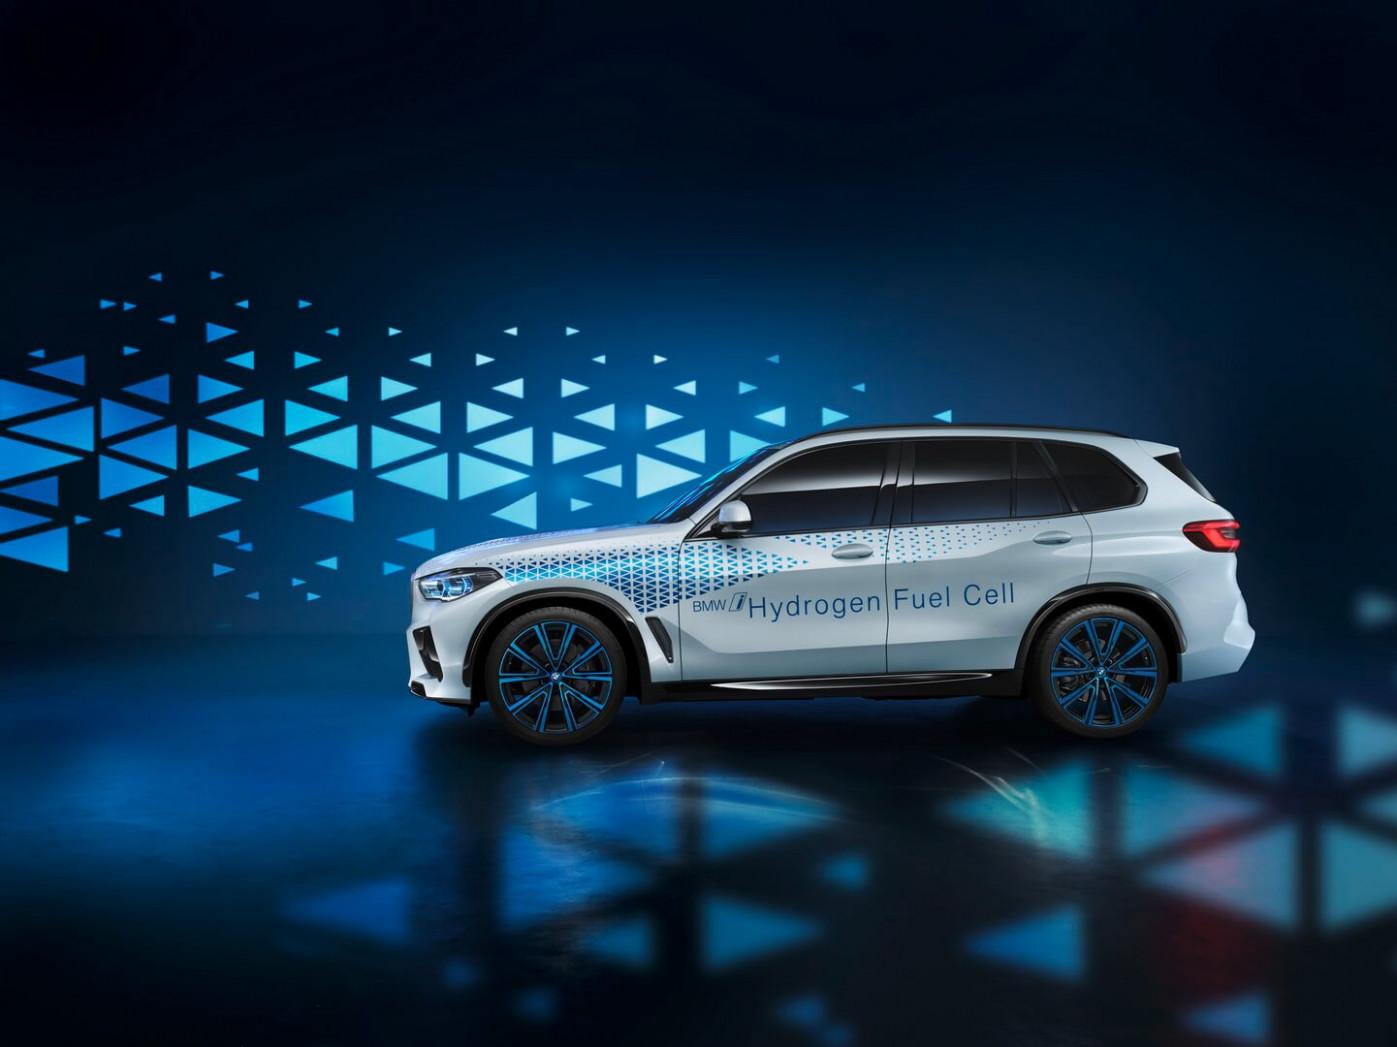 Concept BMW Edrive 2022